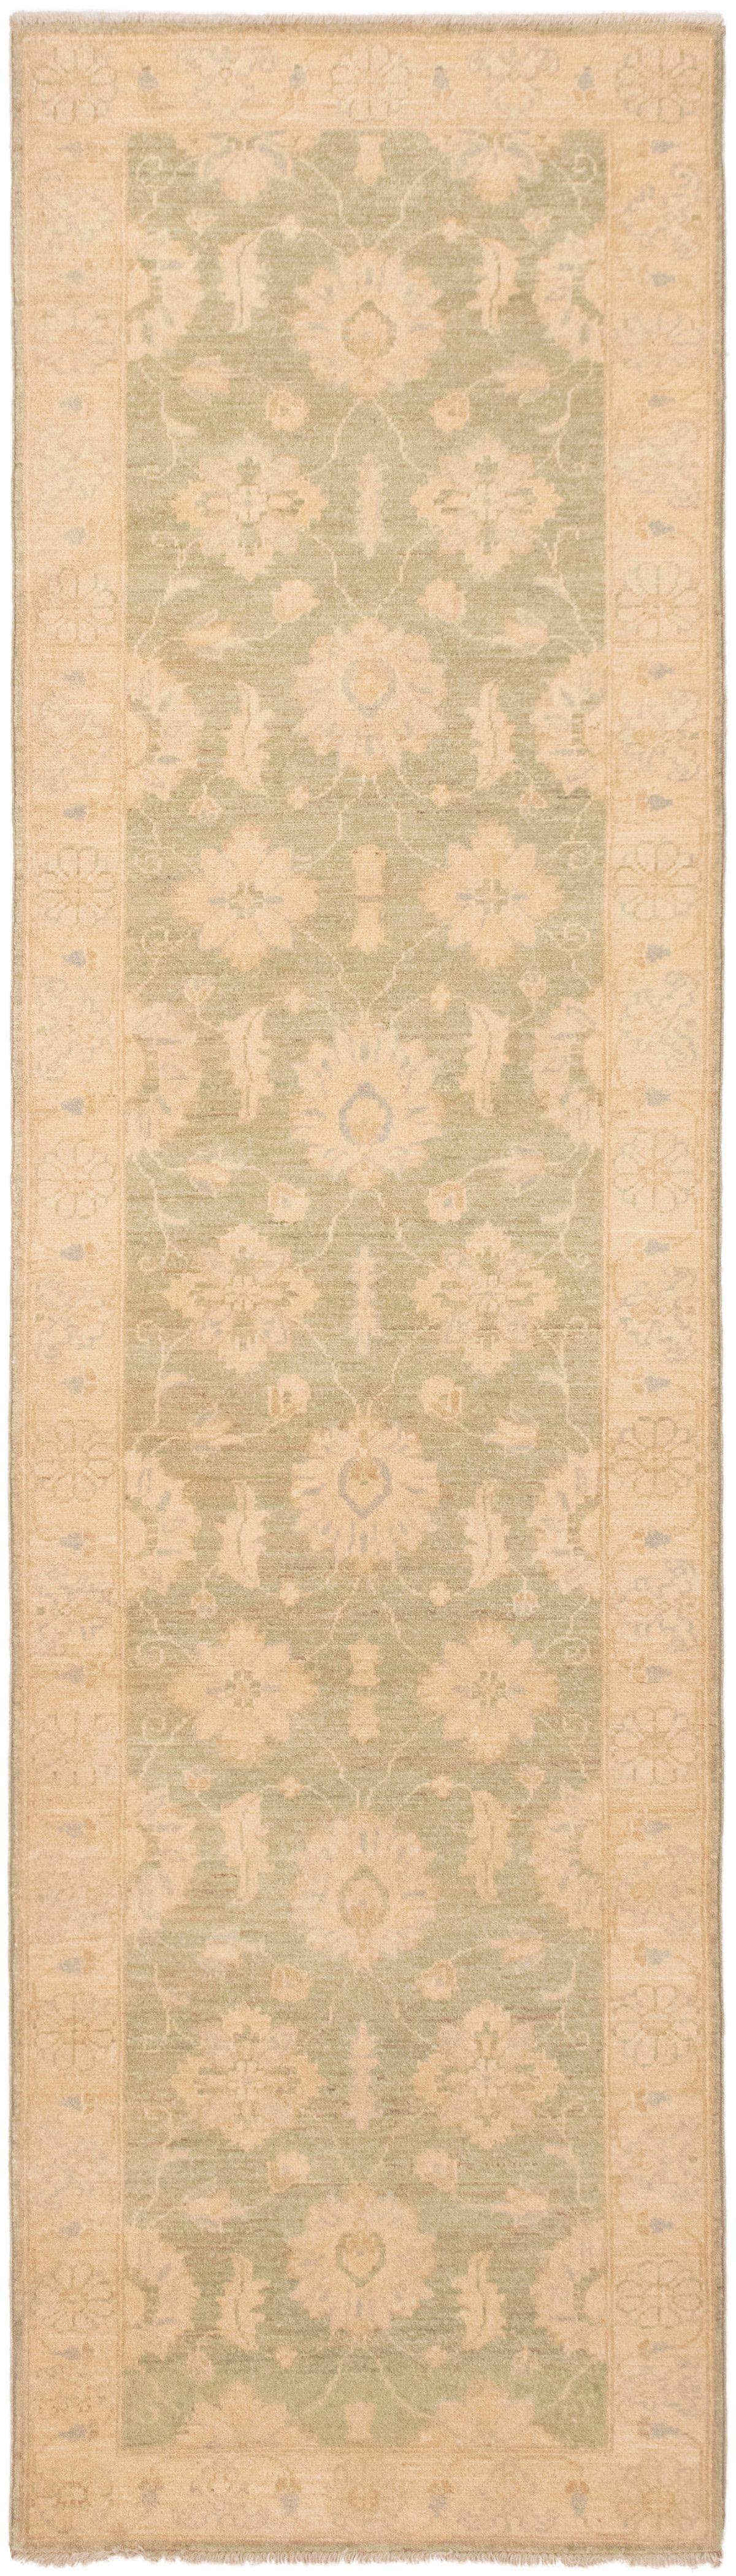 "Hand-knotted Peshawar Oushak Light Gold Wool Rug 2'9"" x 9'10"" Size: 2'9"" x 9'10"""